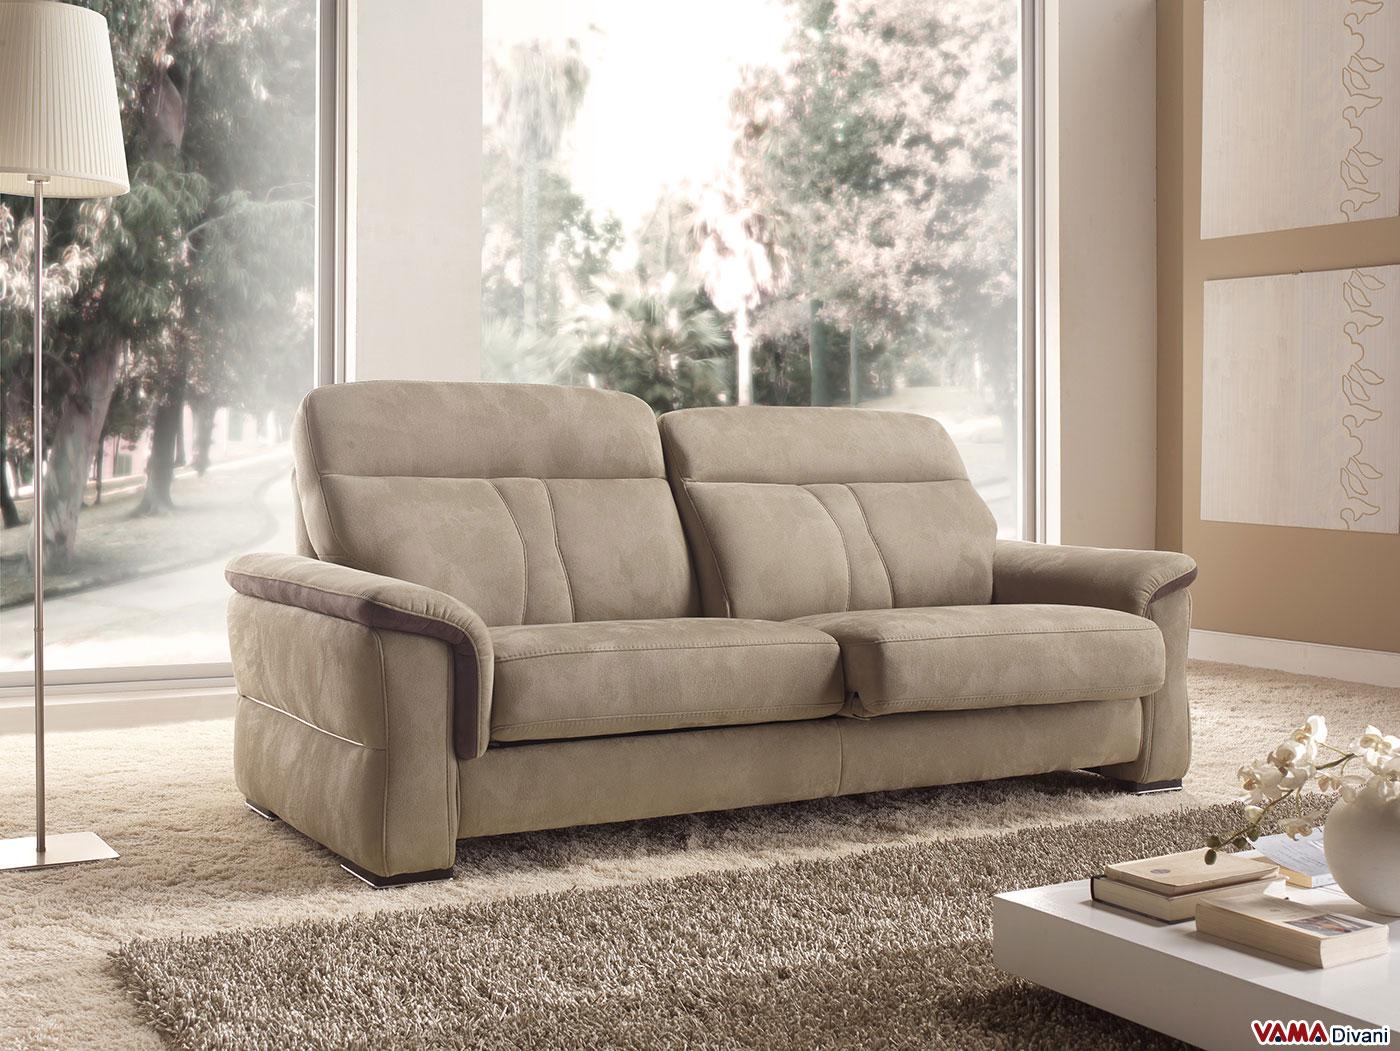 Vama divani blog sherwood il divano moderno con sedute slide - Pulire divano microfibra ...